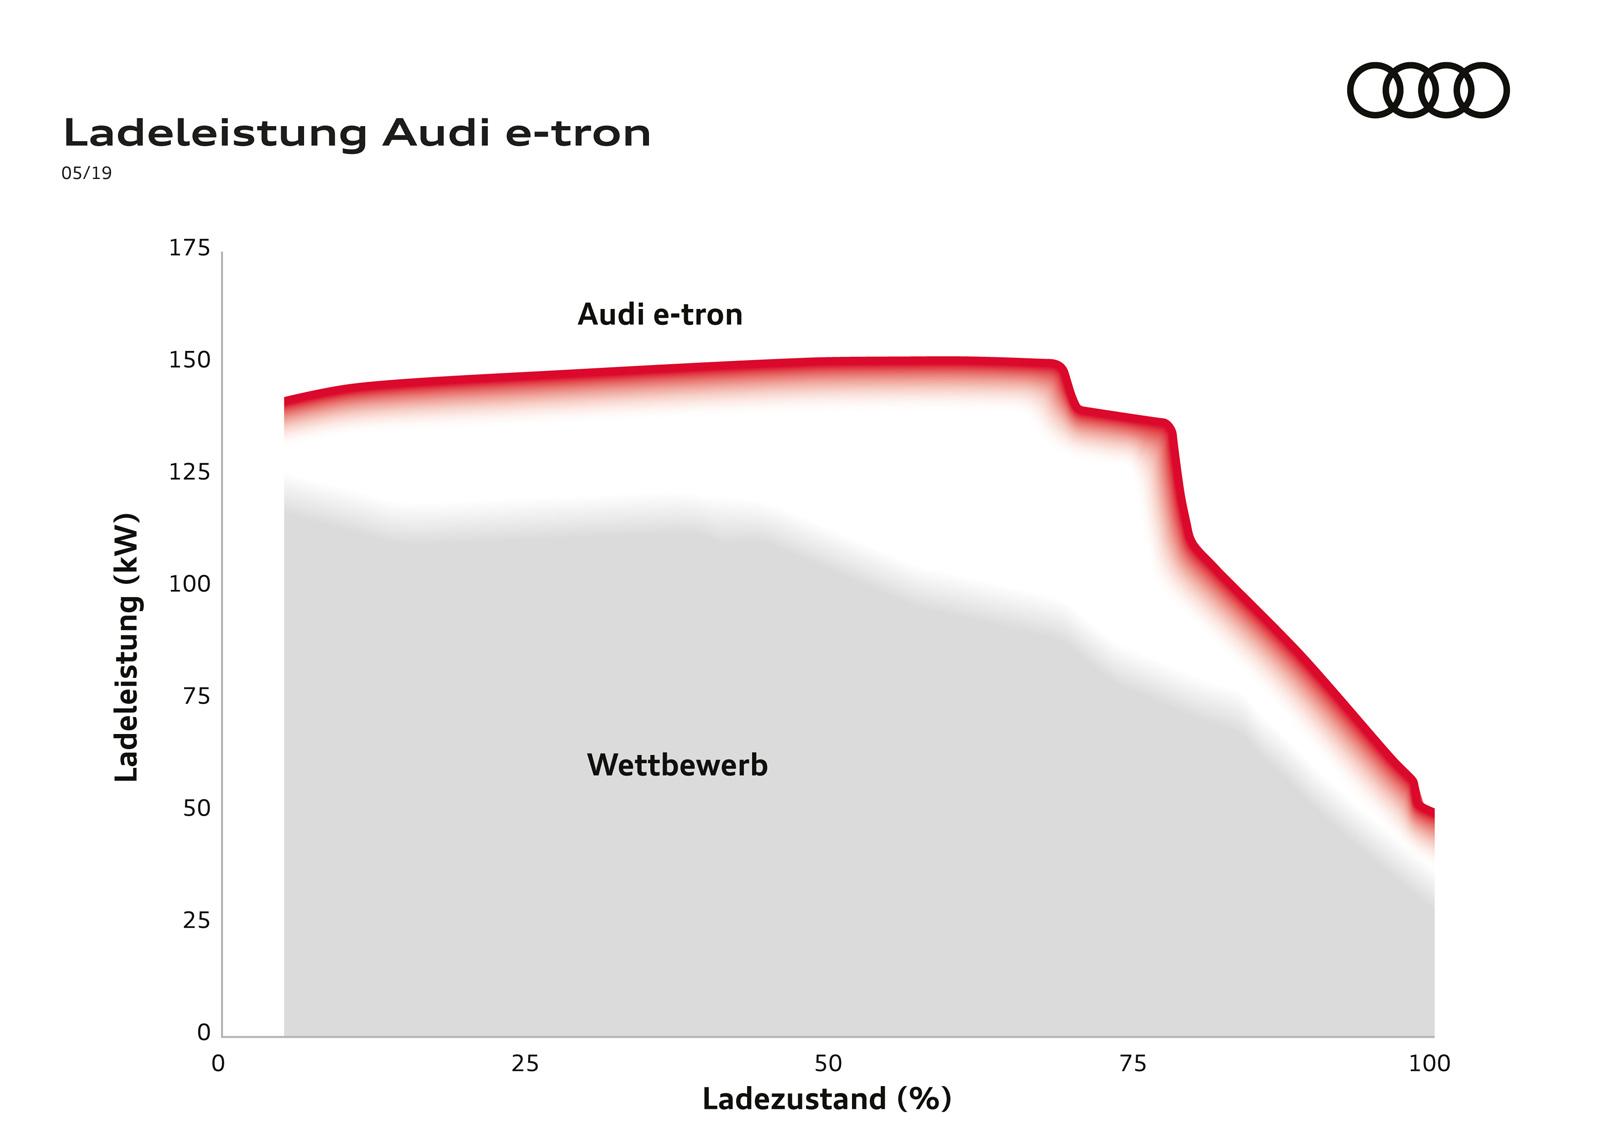 Audi-e-tron-Ladeleistung-Vergleich-1